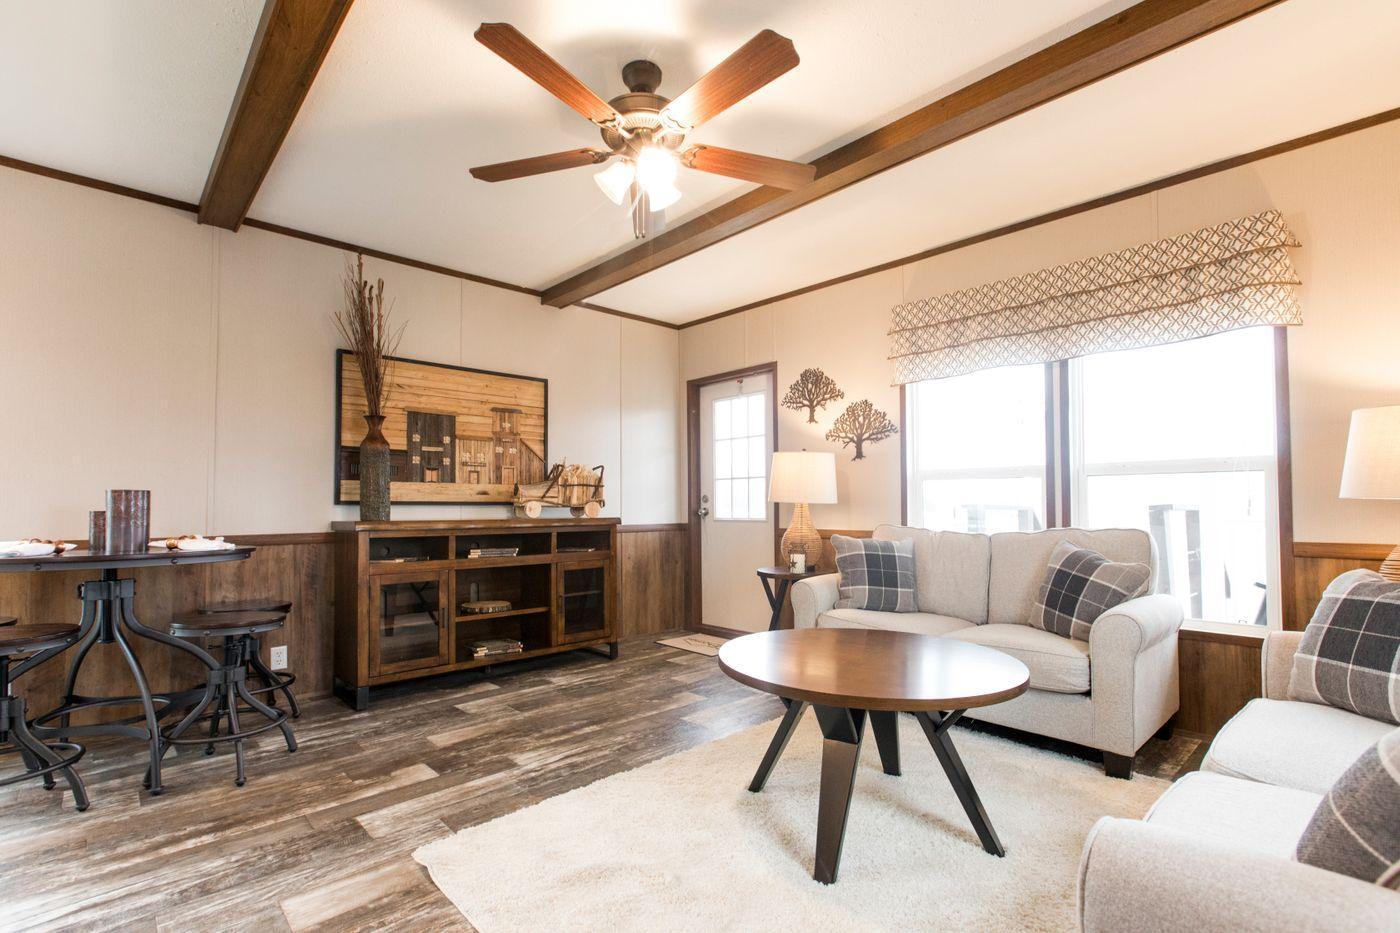 The Lodge Living Room